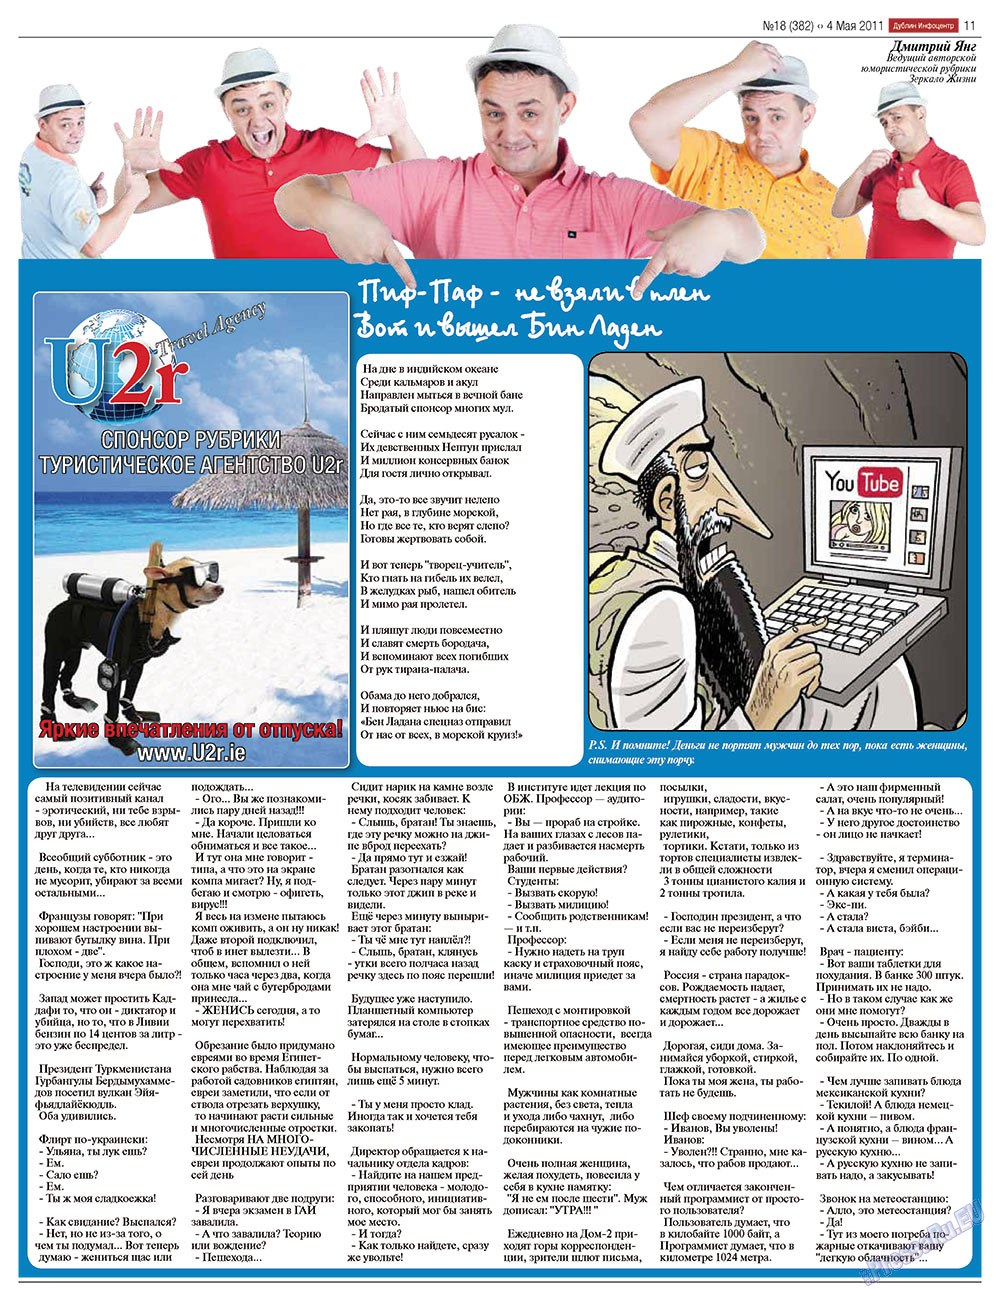 Дублин инфоцентр (газета). 2011 год, номер 18, стр. 11